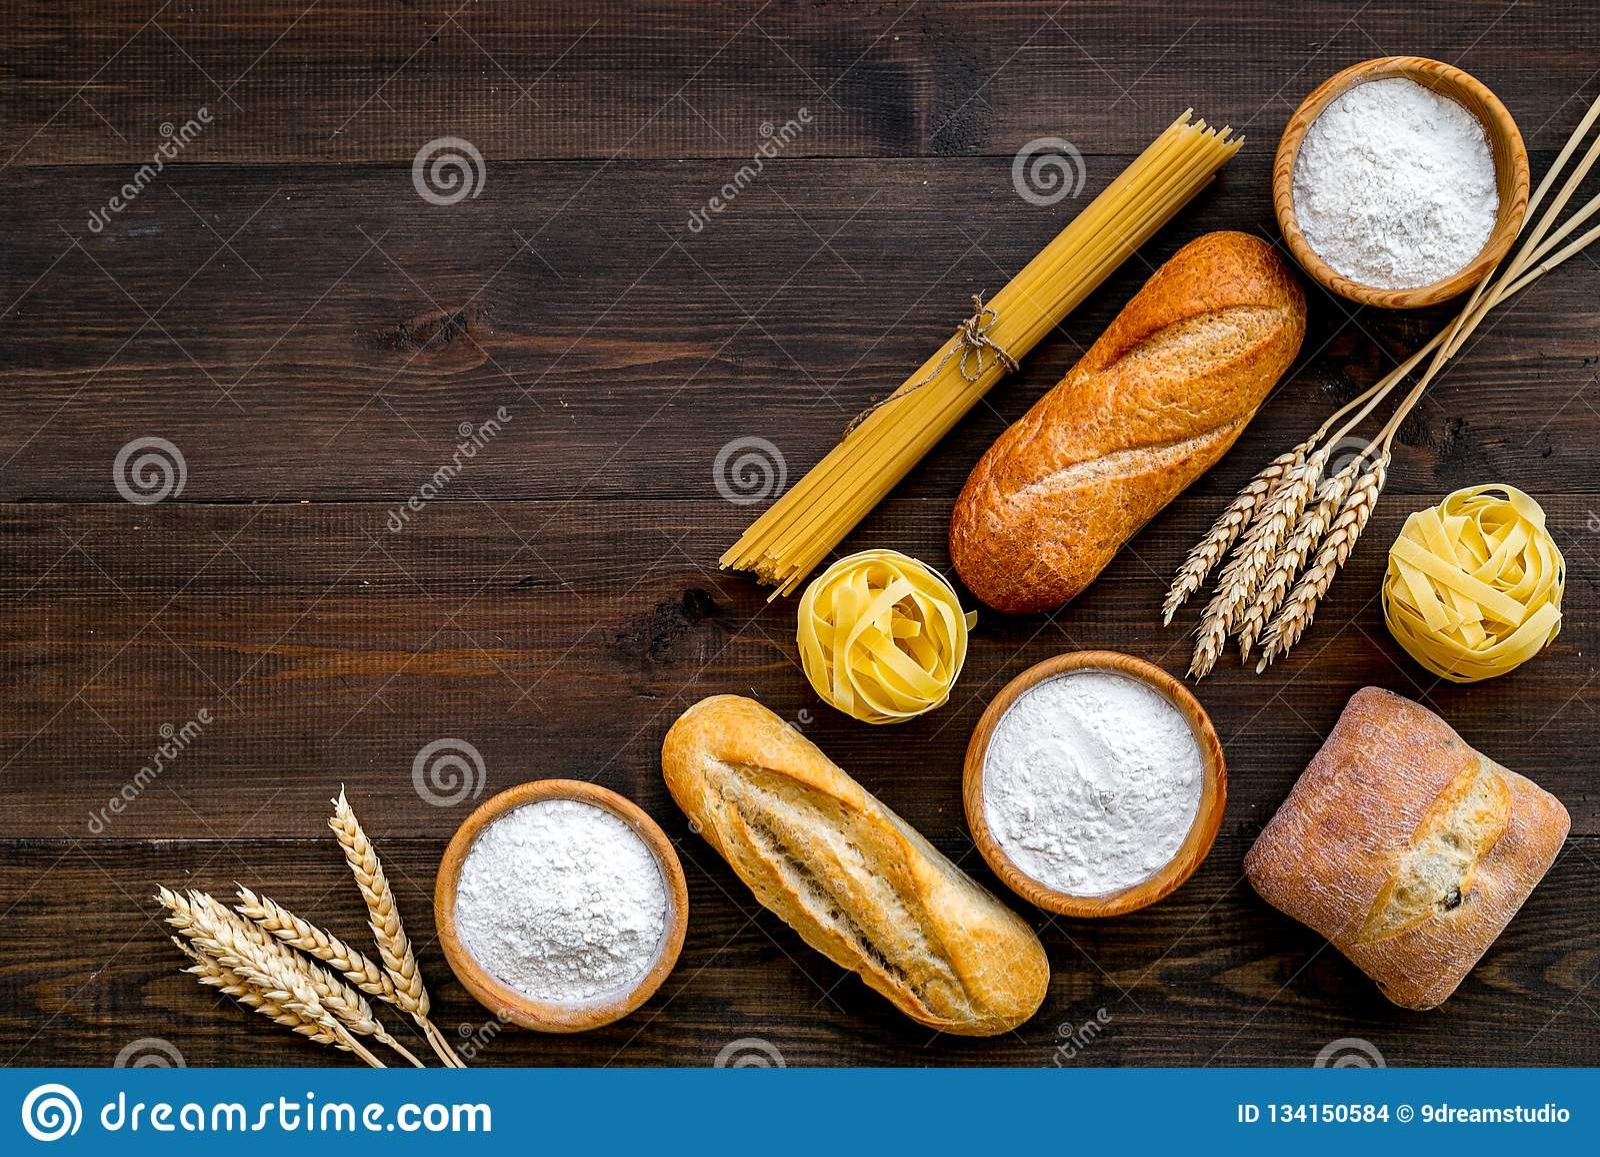 Manufacturing manufacture wheat flour bread